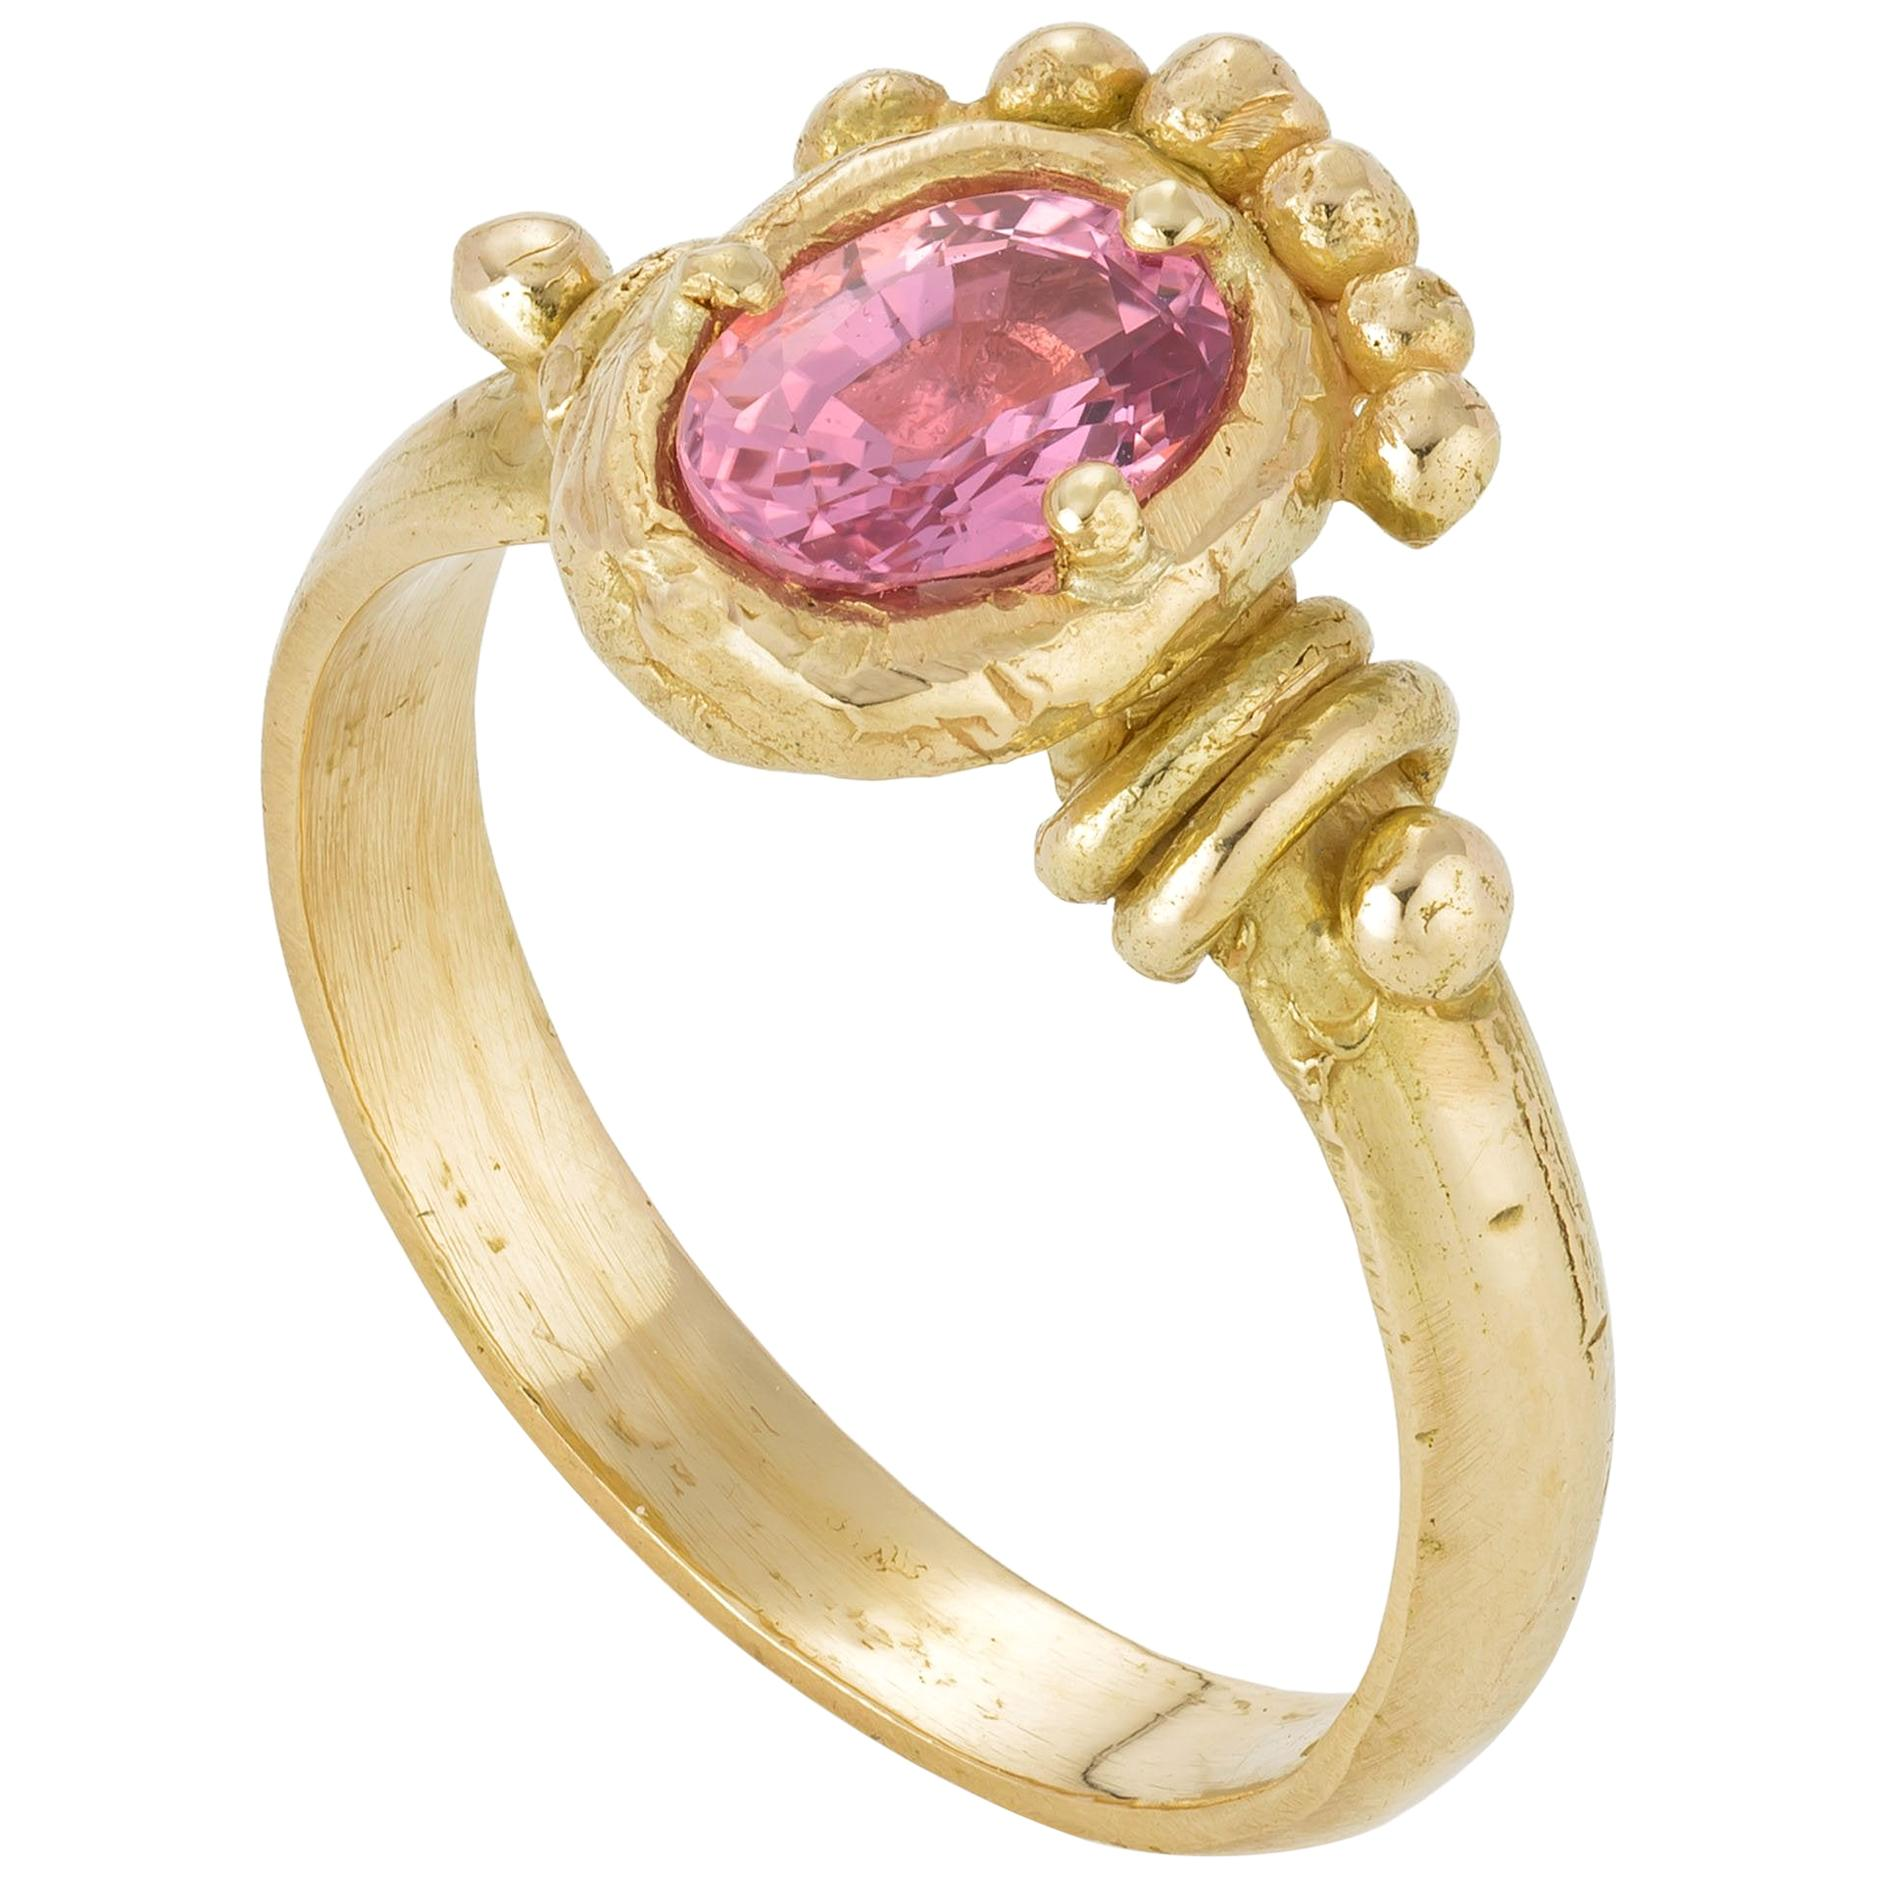 Fajar Ring, 18 Karat Yellow Gold with Sapphire